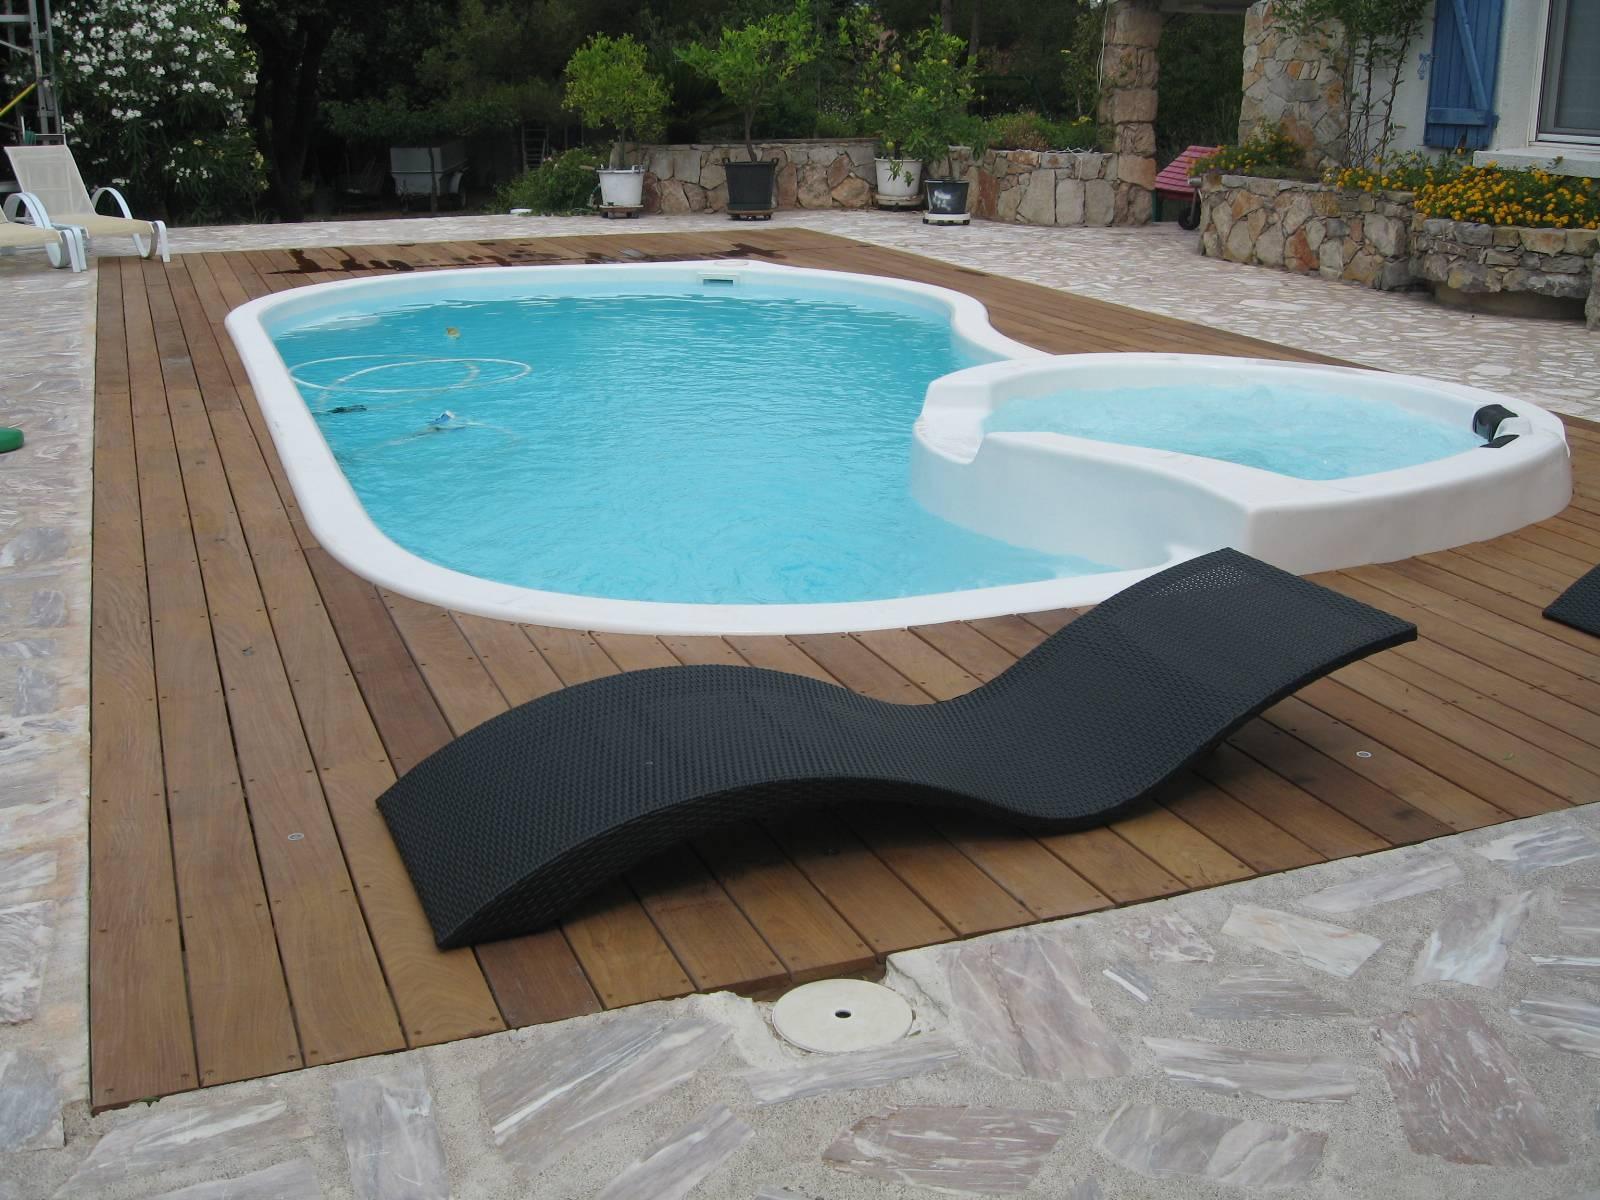 Piscine Coque Polyester Modele Tropicana Spa Specialiste De La